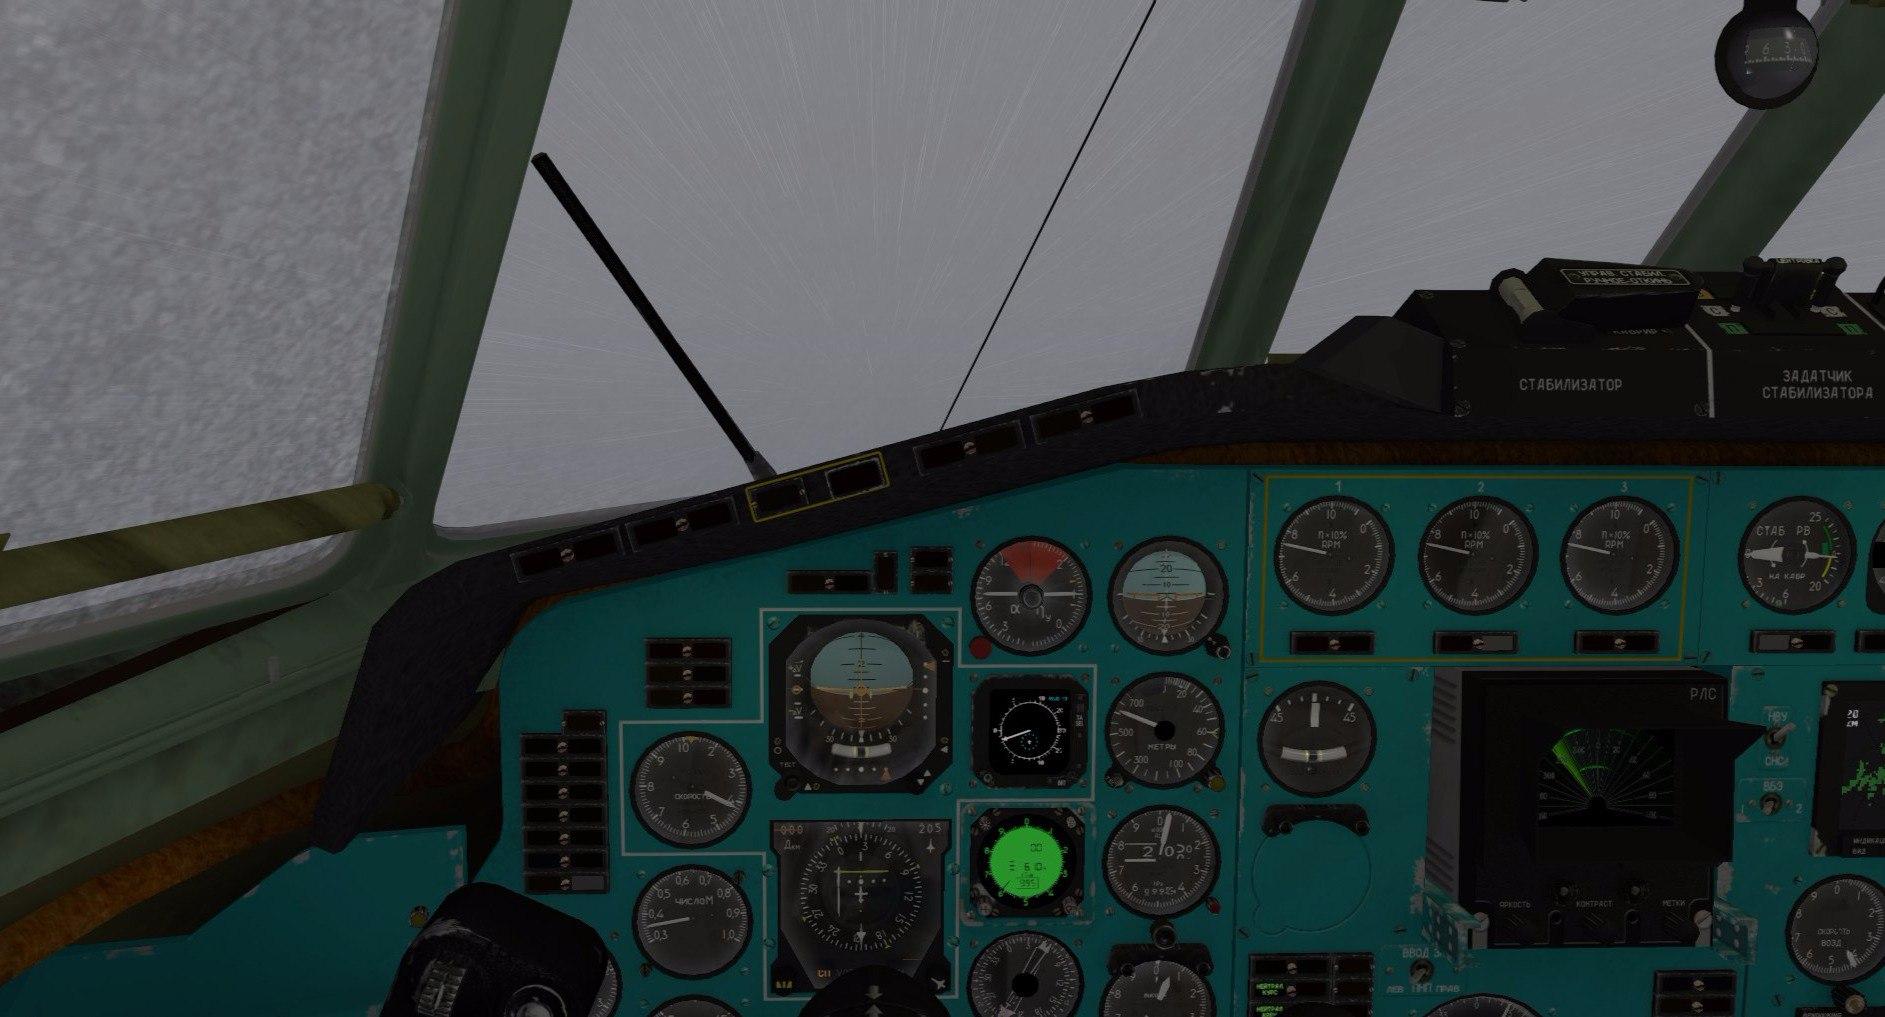 gN6P6sKx3Mc.jpg